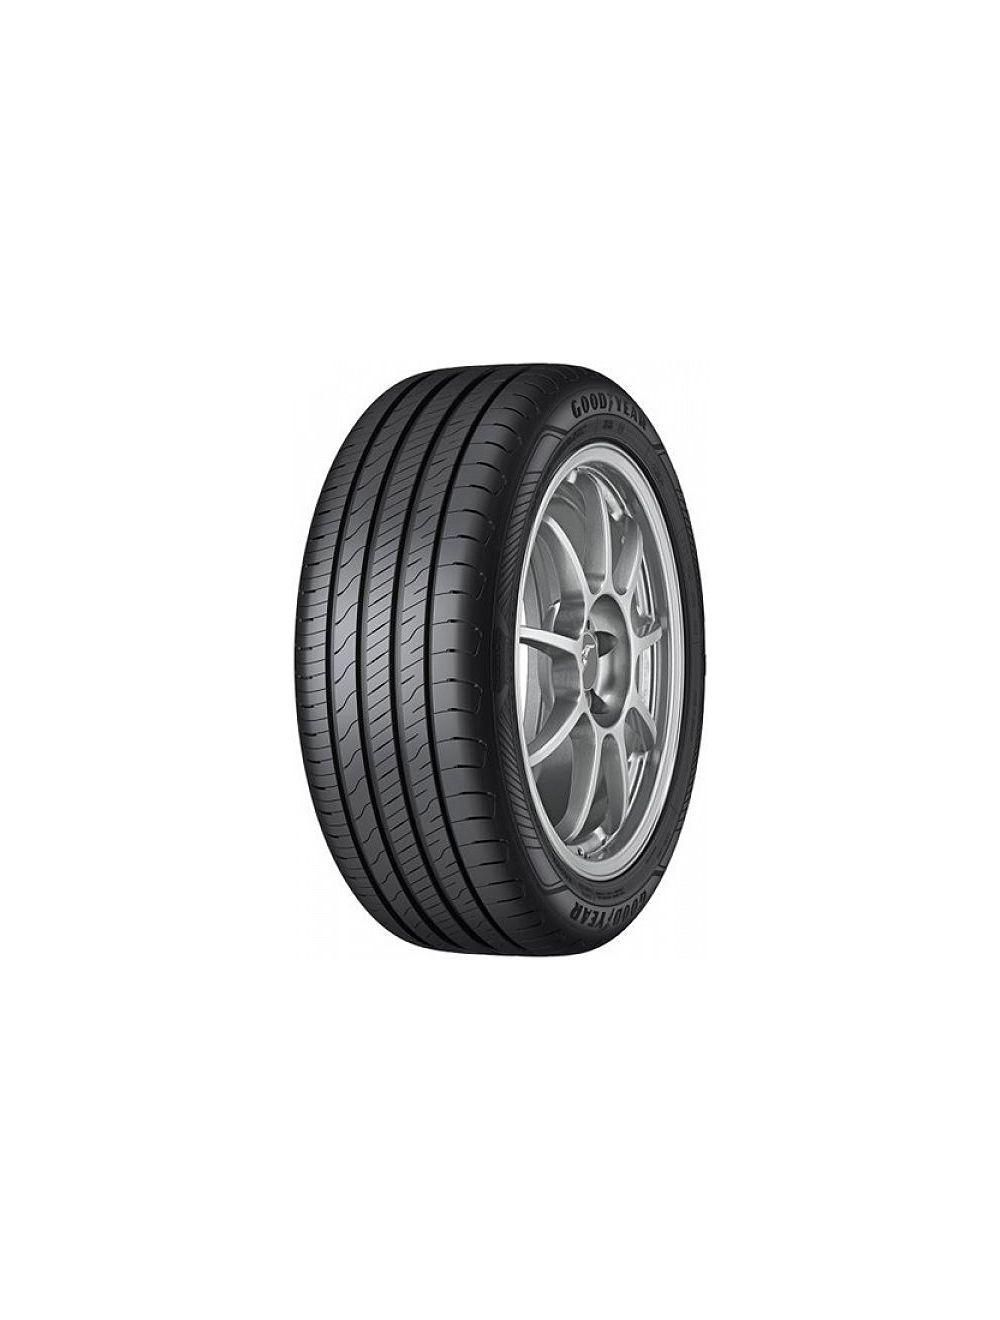 Goodyear 195/55R16 H Efficientgrip Performance 2 Nyári gumi